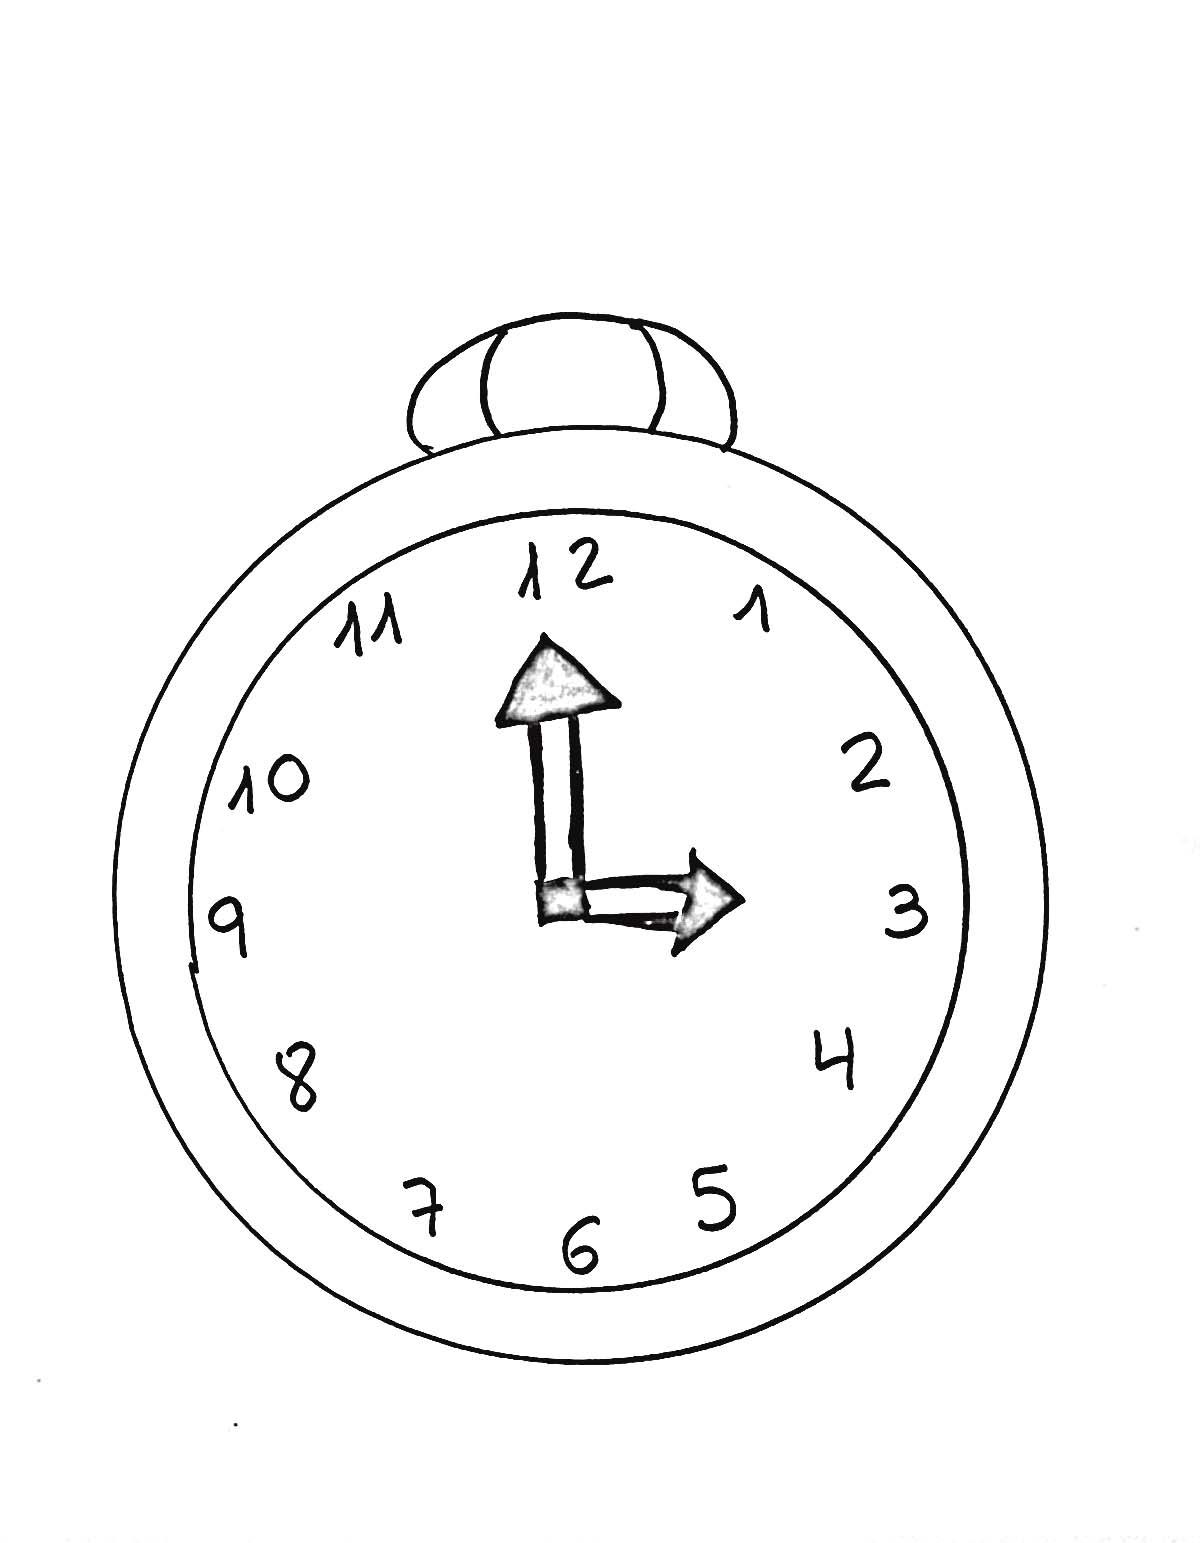 Worksheet. Dibujos De Relojes Images  Reverse Search